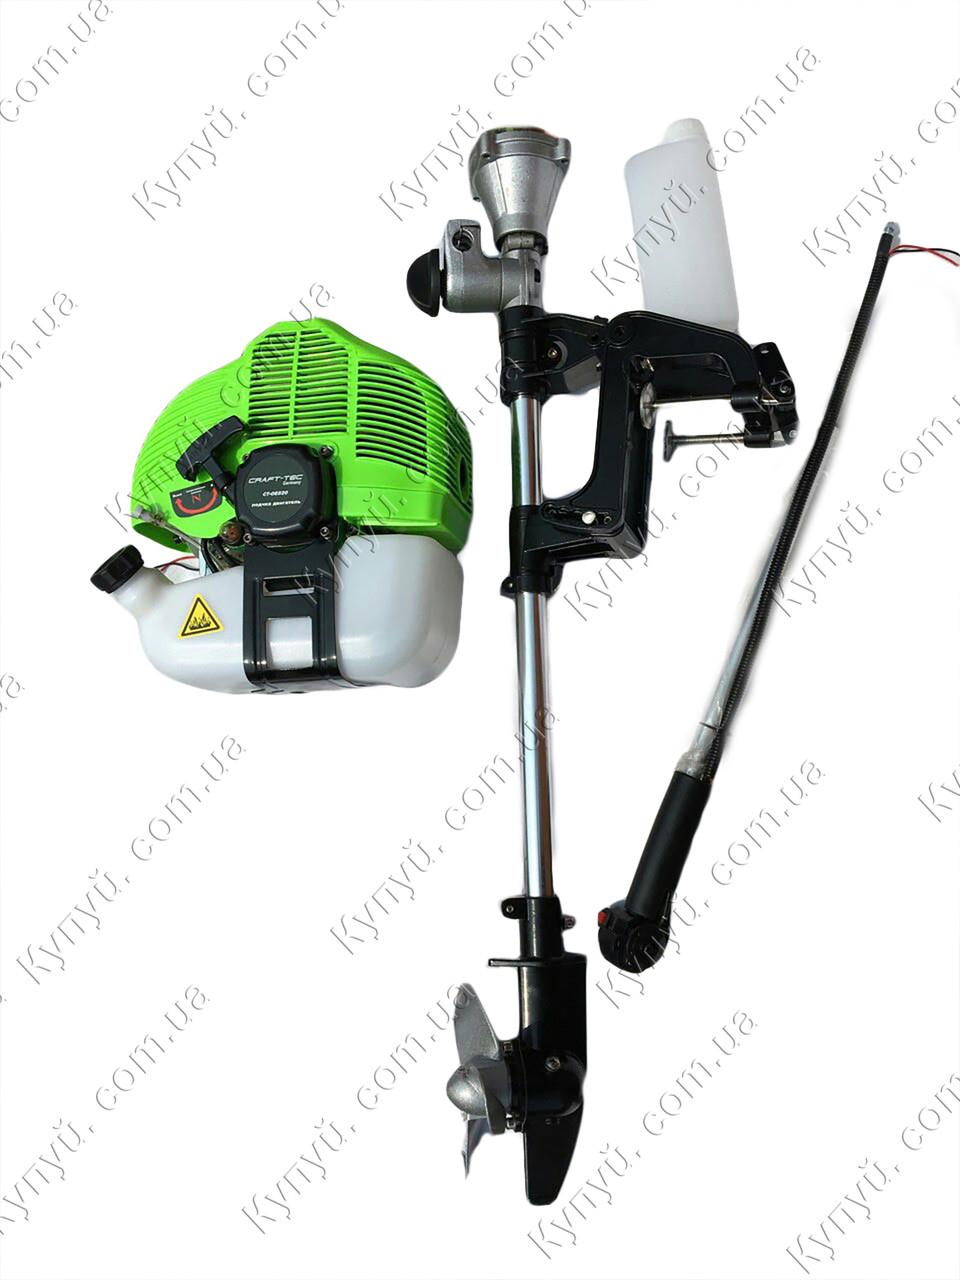 Мотор лодочный Craft-tec CT-OE820